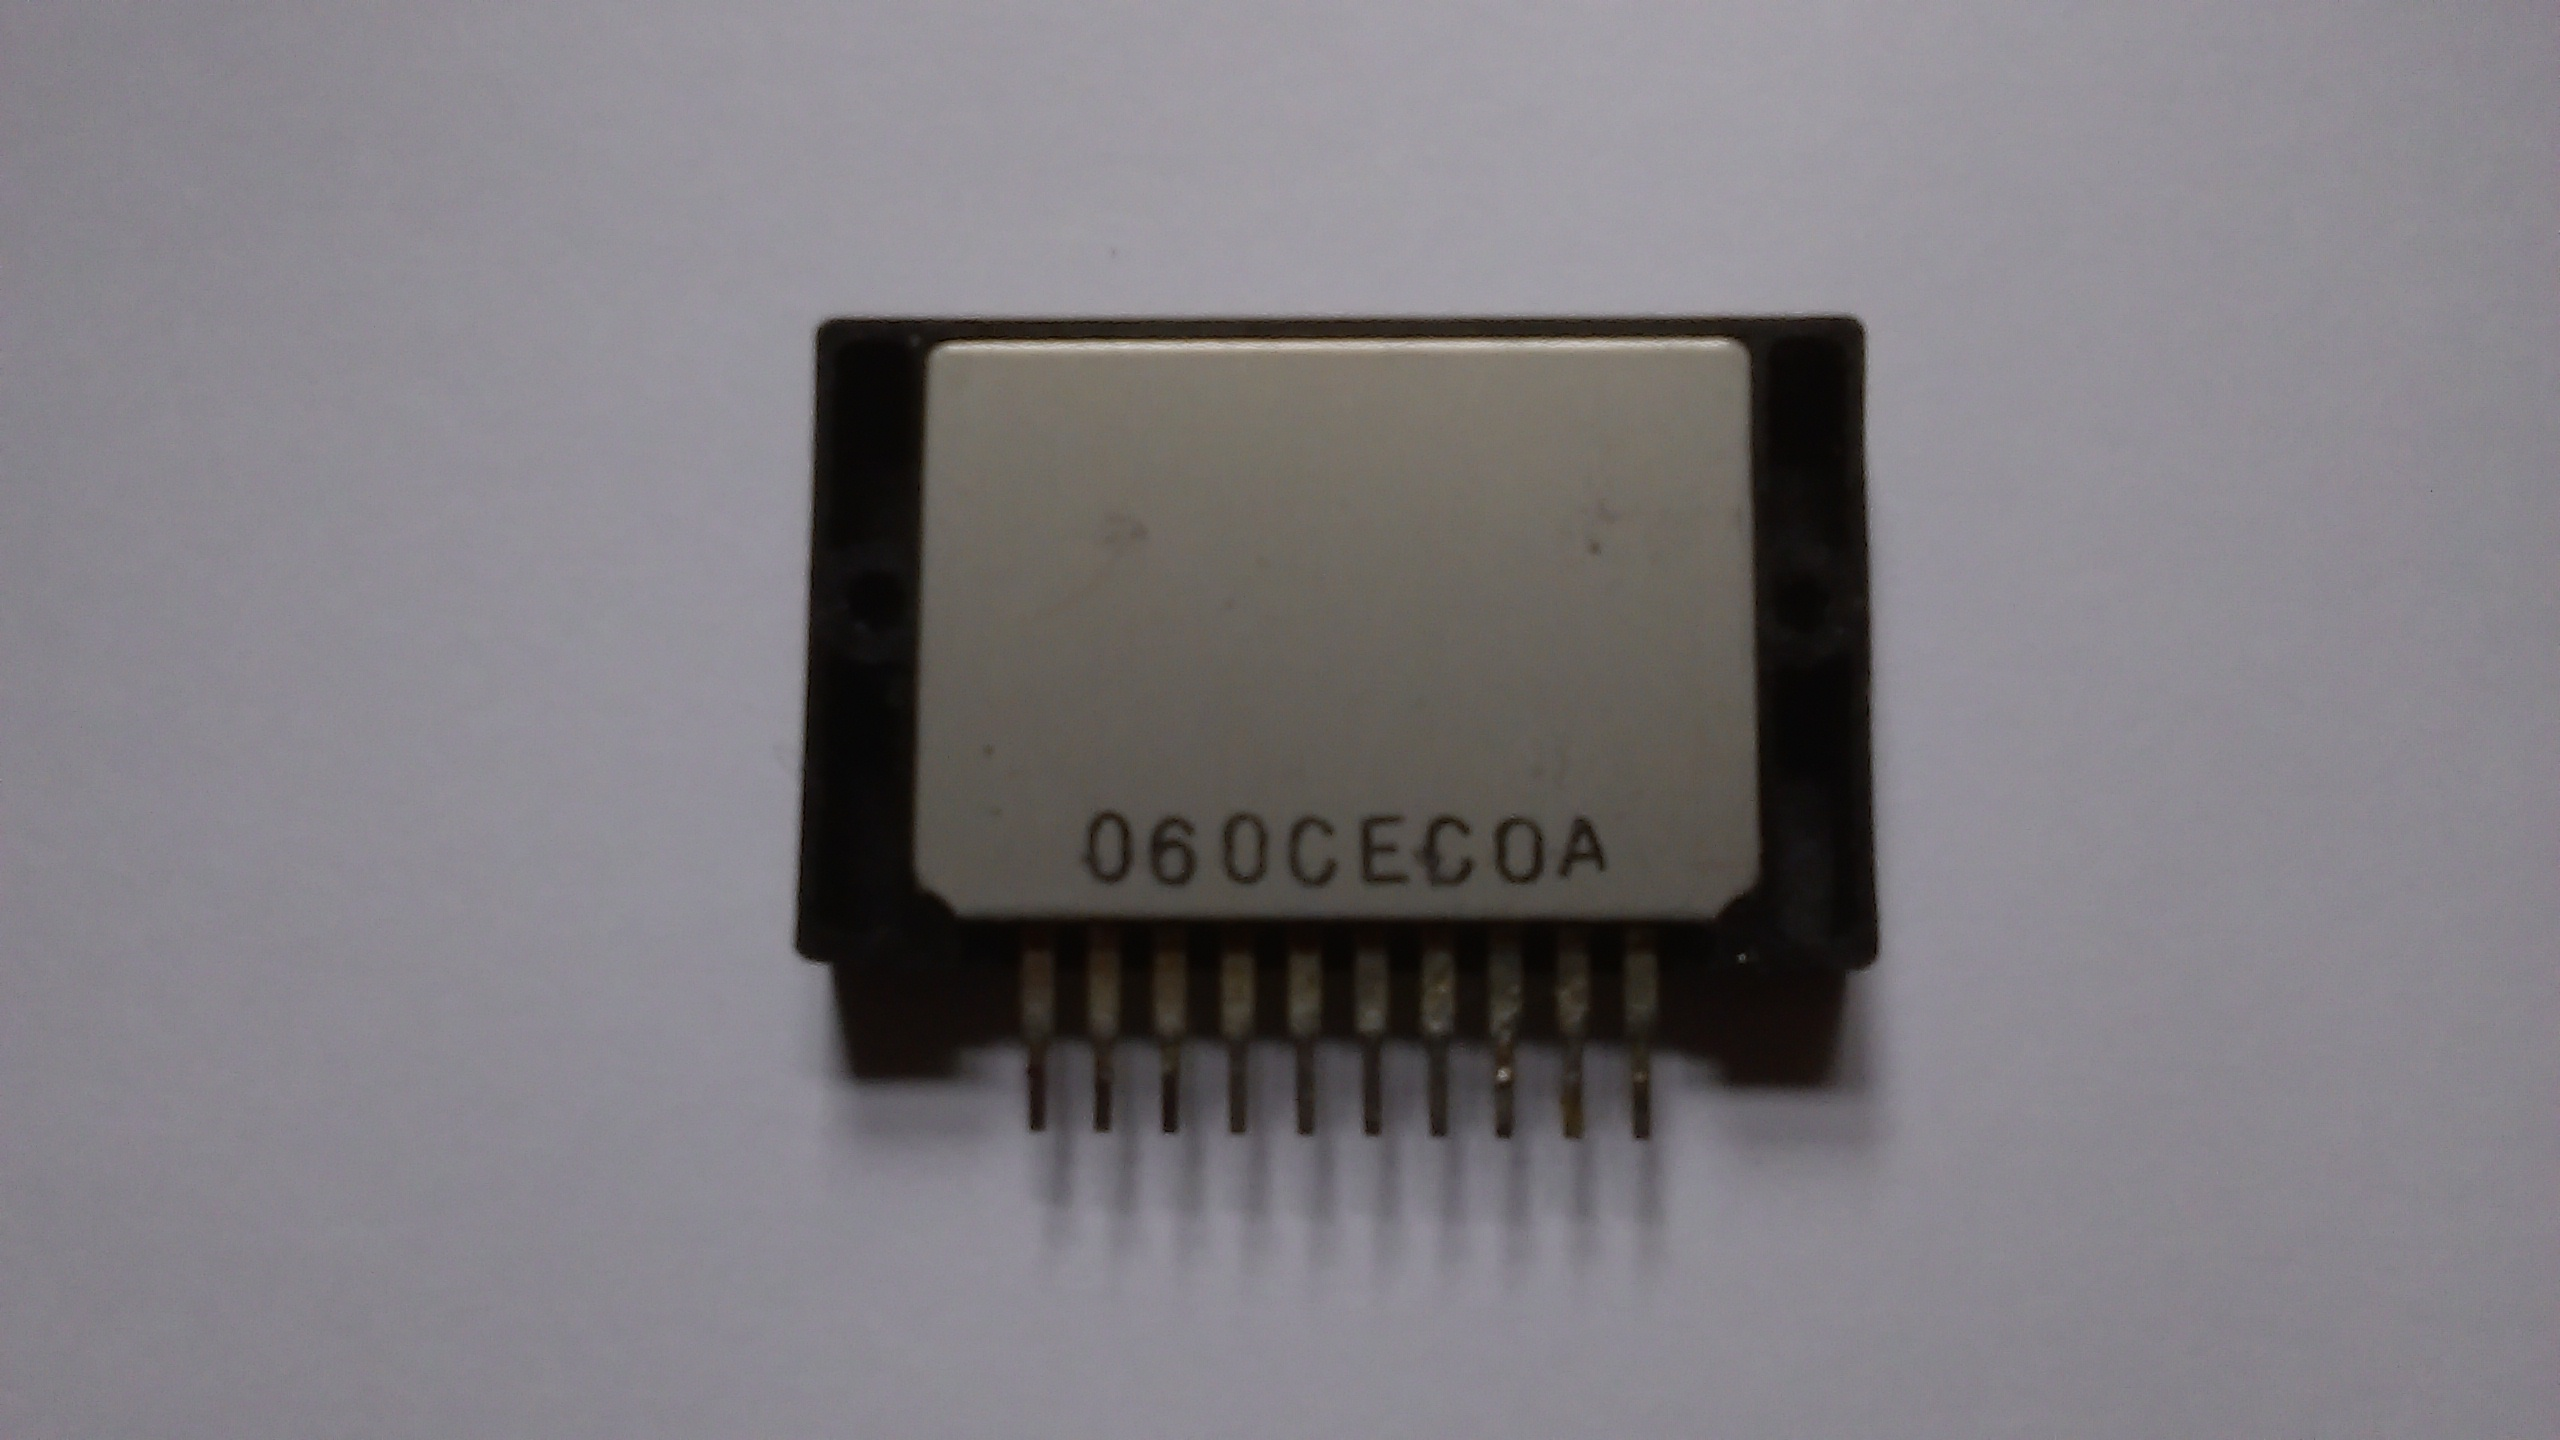 Stk 0060 Stk0060 Modu Darlington Power Pack 7408685741 Audio Amplifier Circuit Using